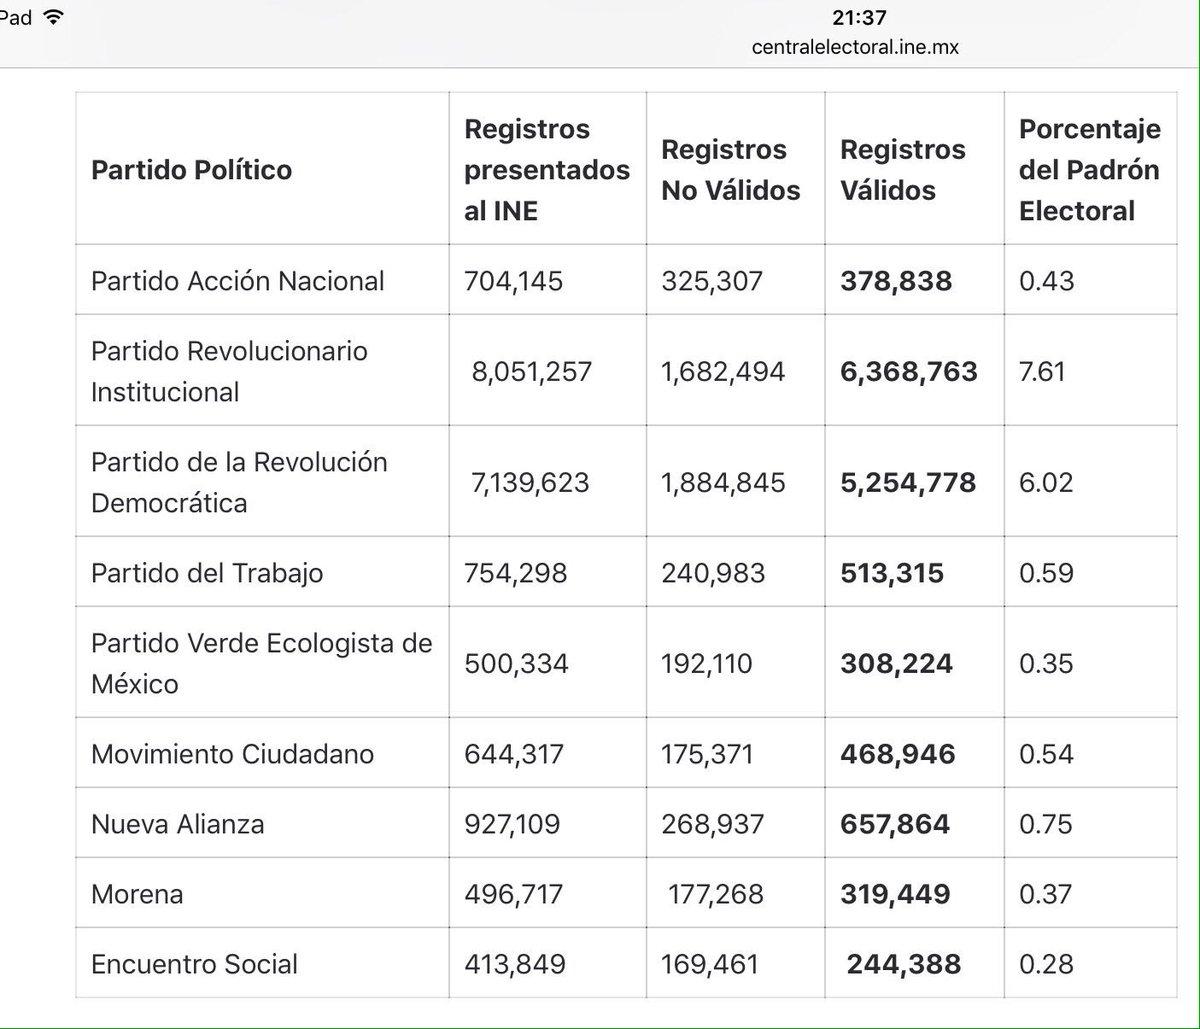 Sí, muy feo eso de inflar números y mandar registros inválidos al @INEMexico. Muy feo. https://t.co/Srq50mwbvc